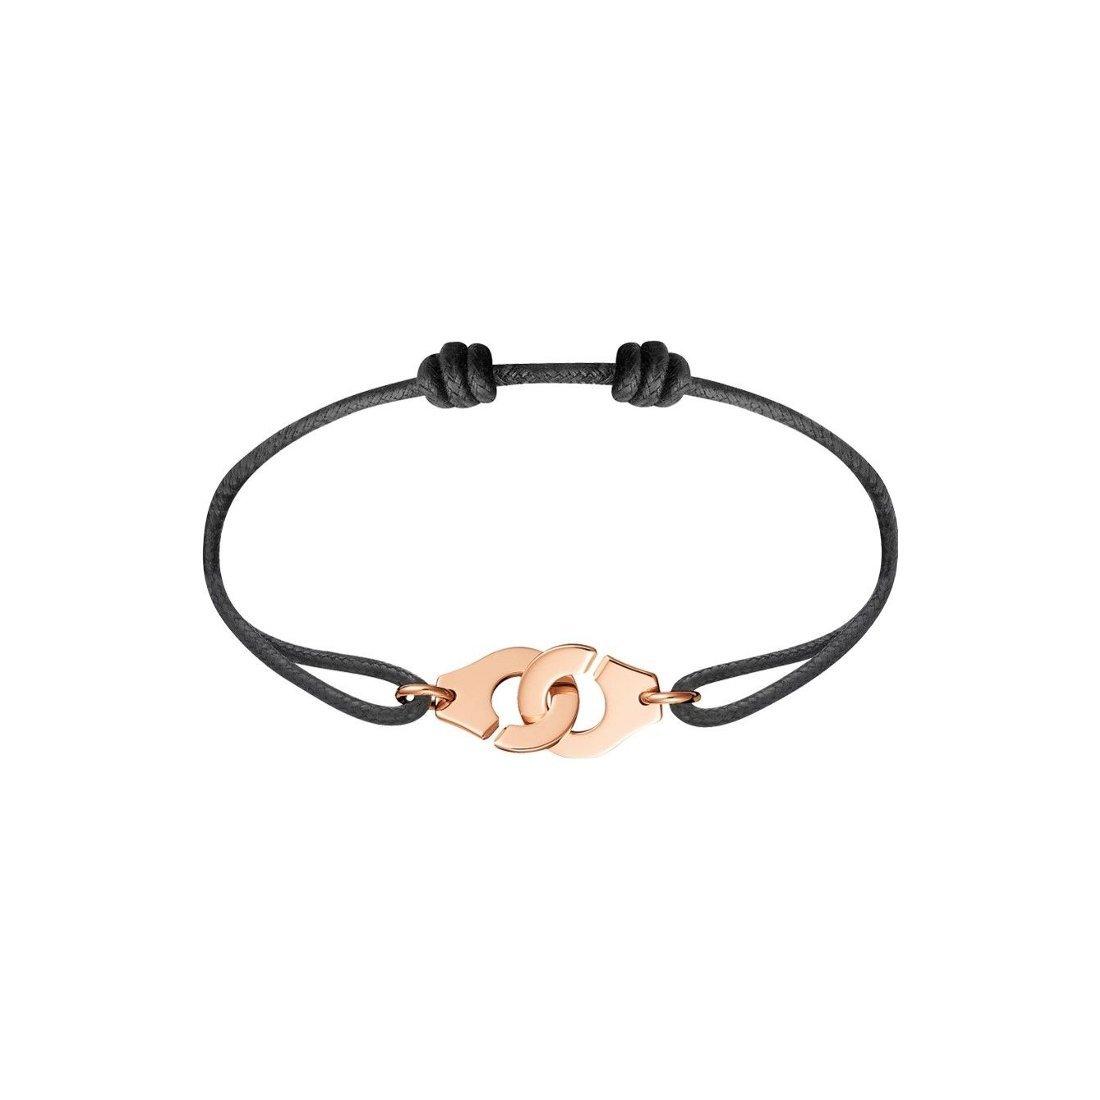 Bracelet sur cordon dinh van Menottes dinh van R12 en or rose vue 1